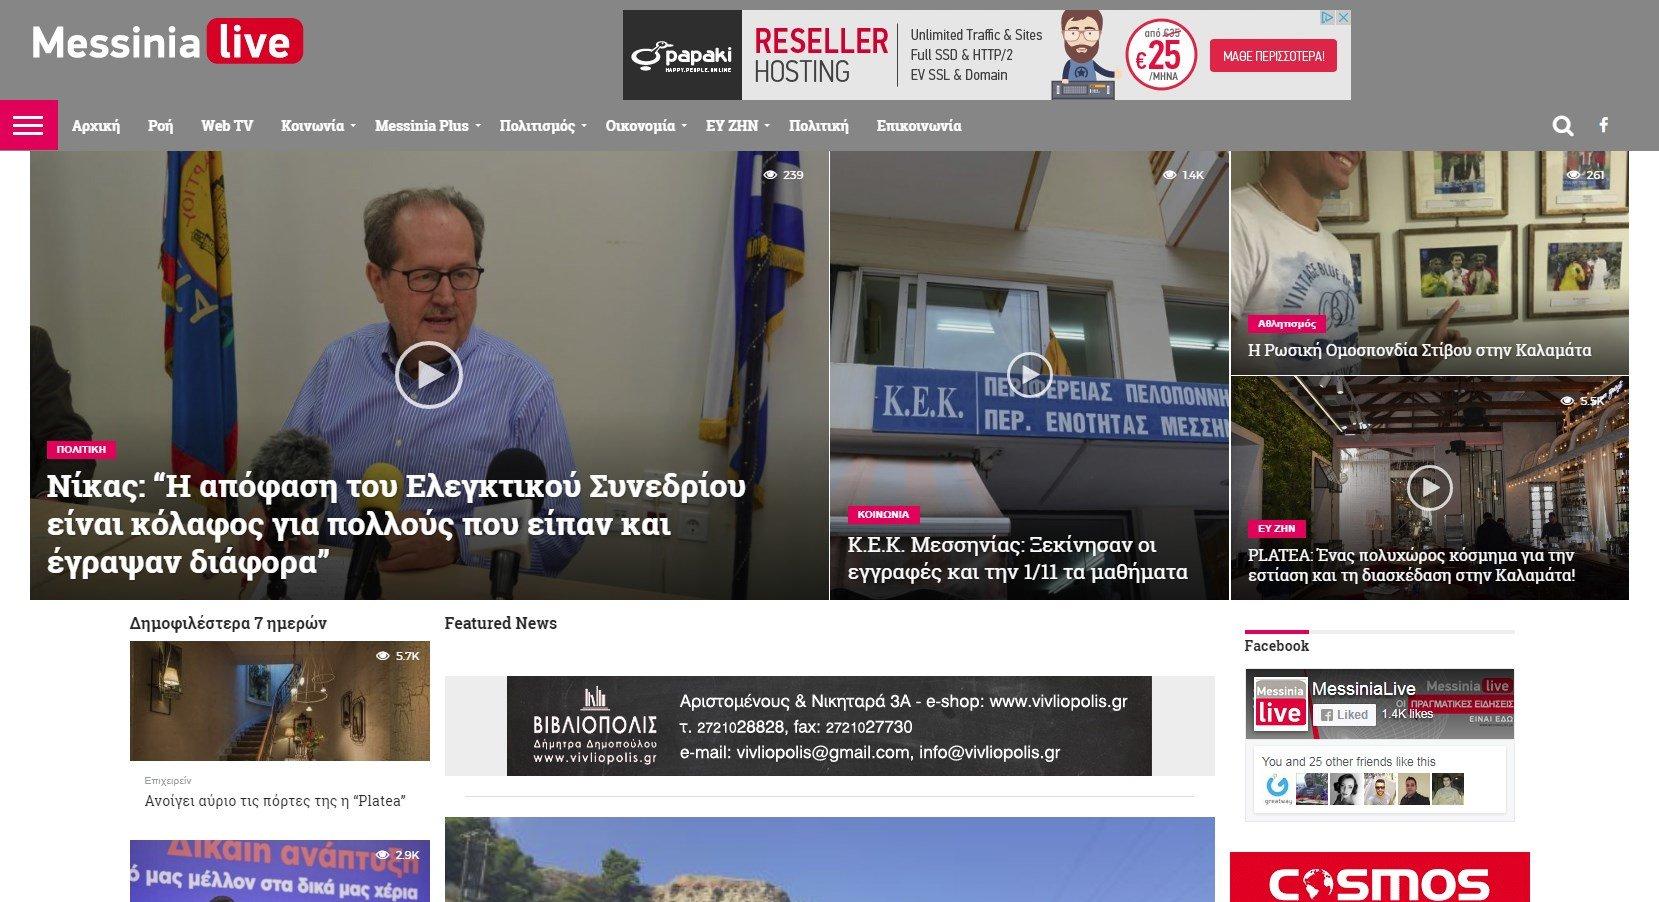 MessiniaLive.gr | Νέα και ειδήσεις από Μεσσηνία